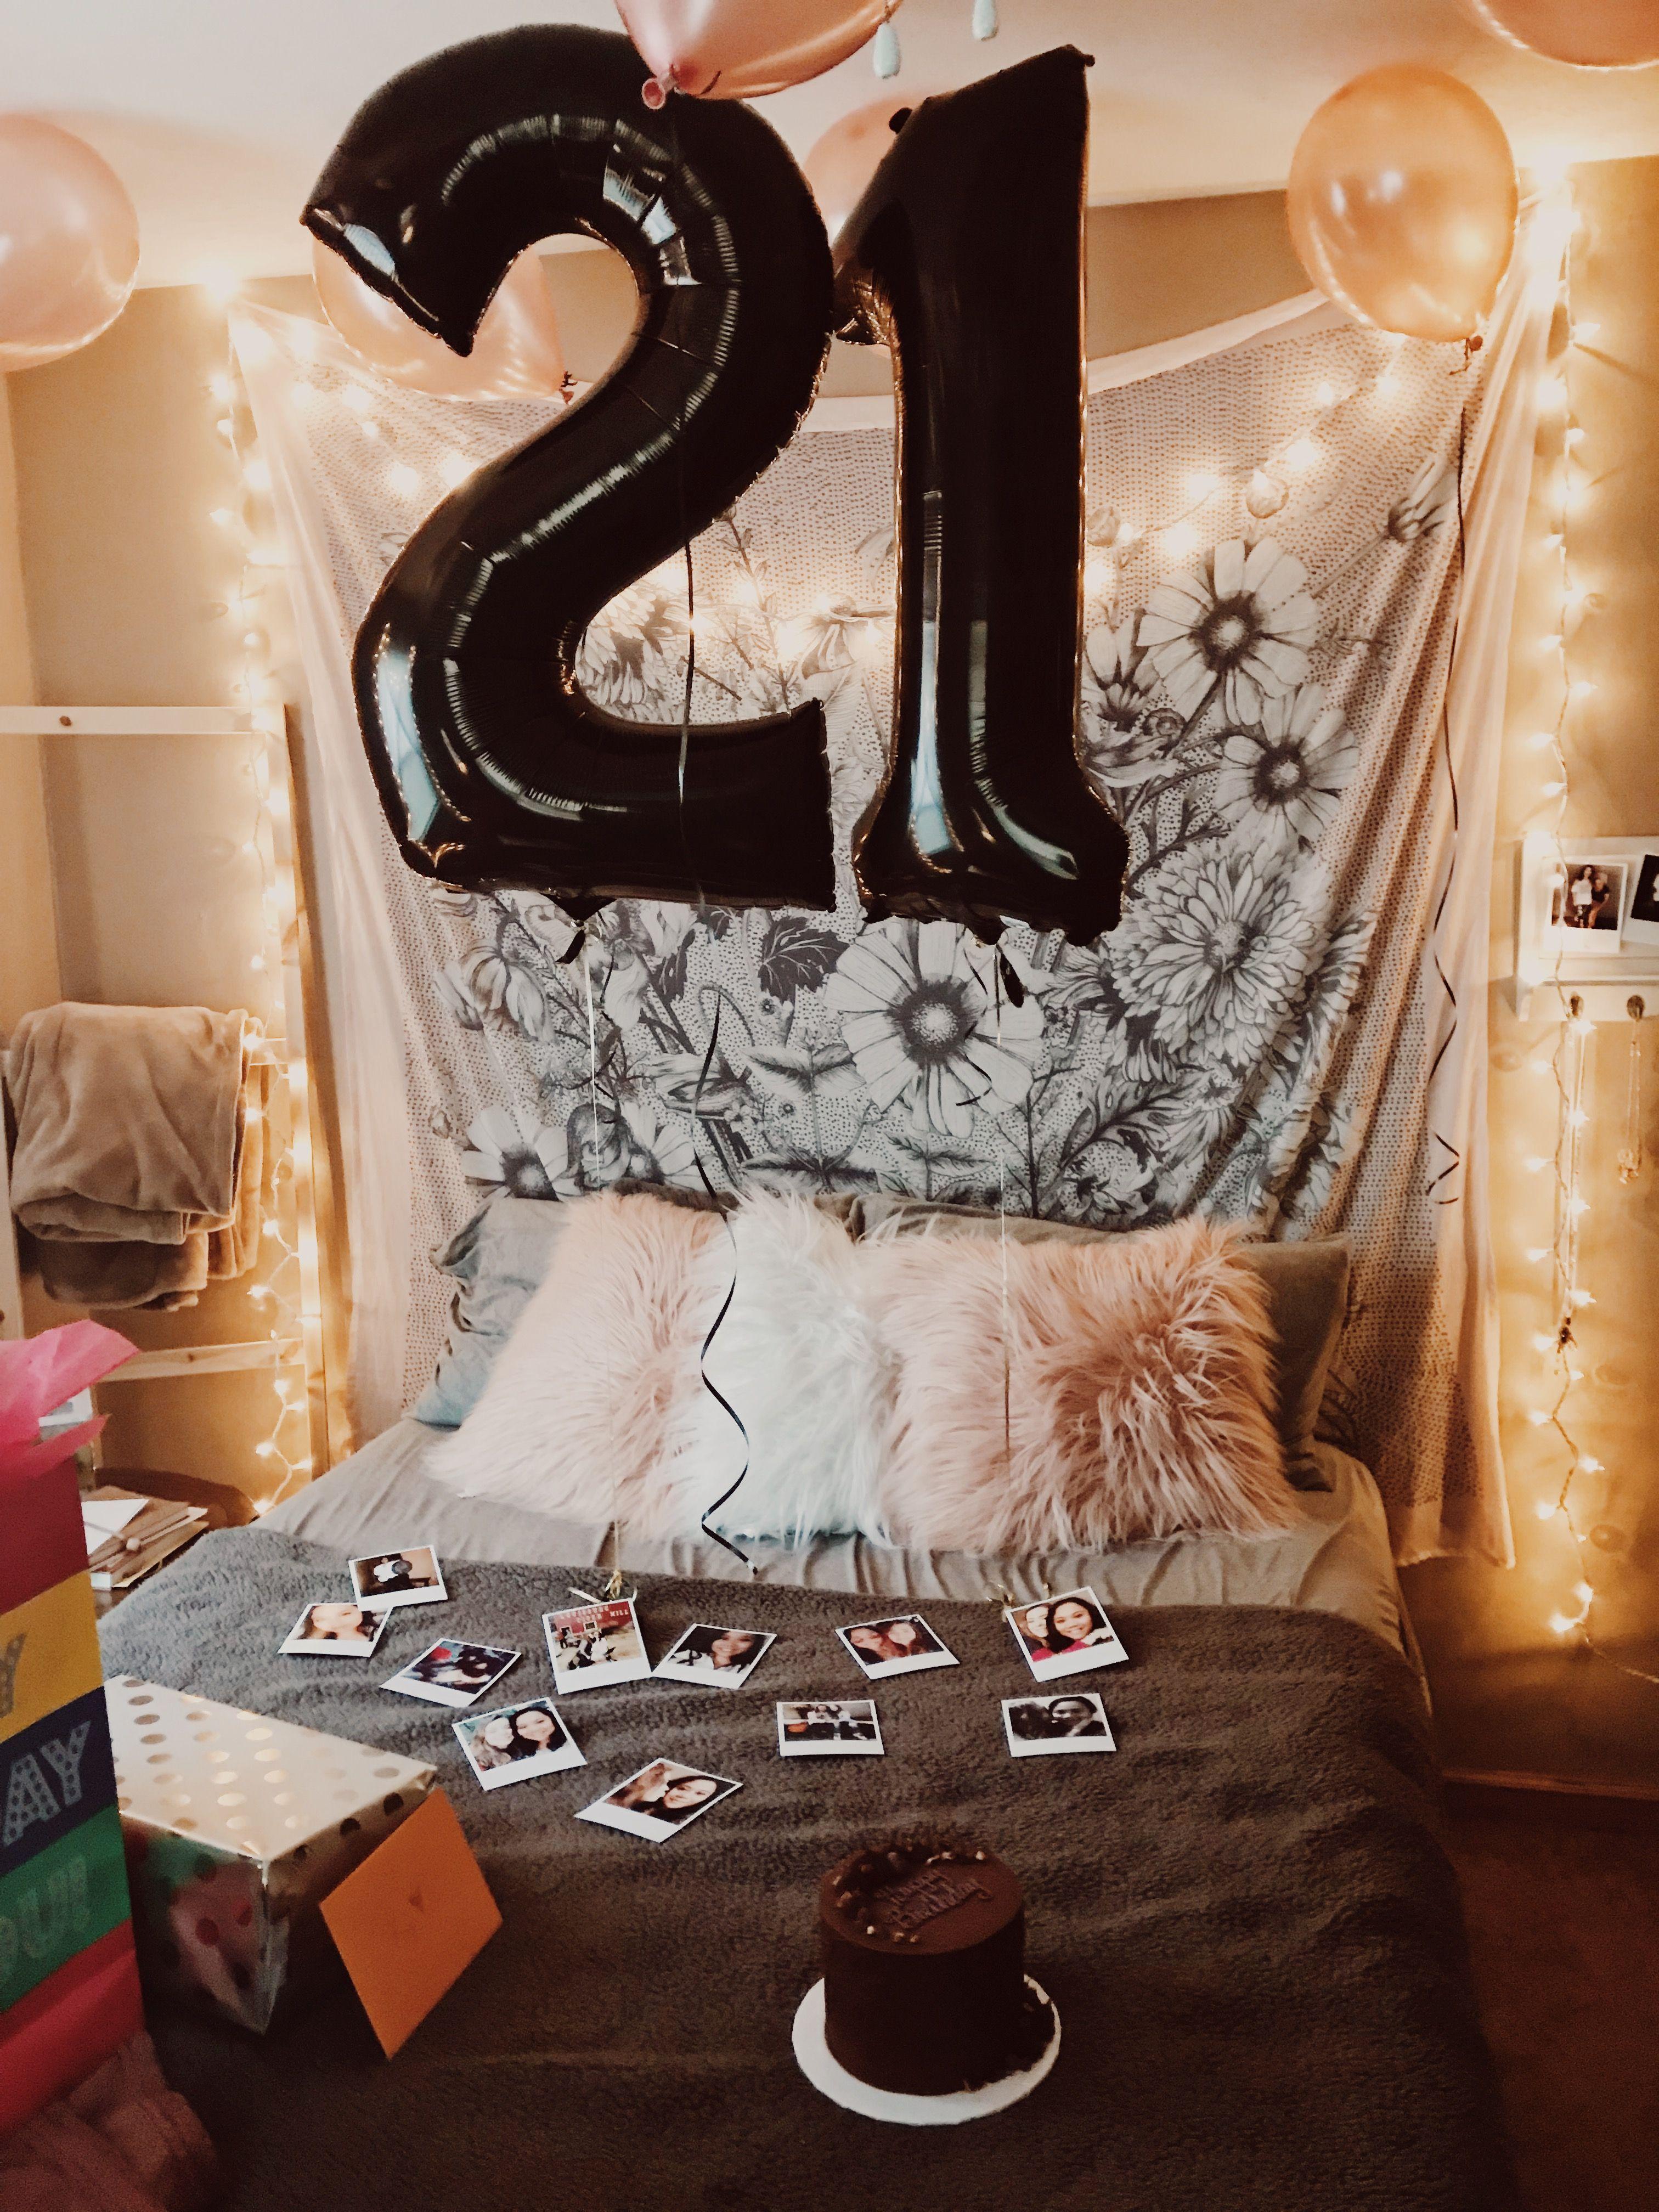 21st Birthday Girlfriend 21 Balloons Surprise Party Presents Bedroom Girlfriendbirthdaygifts